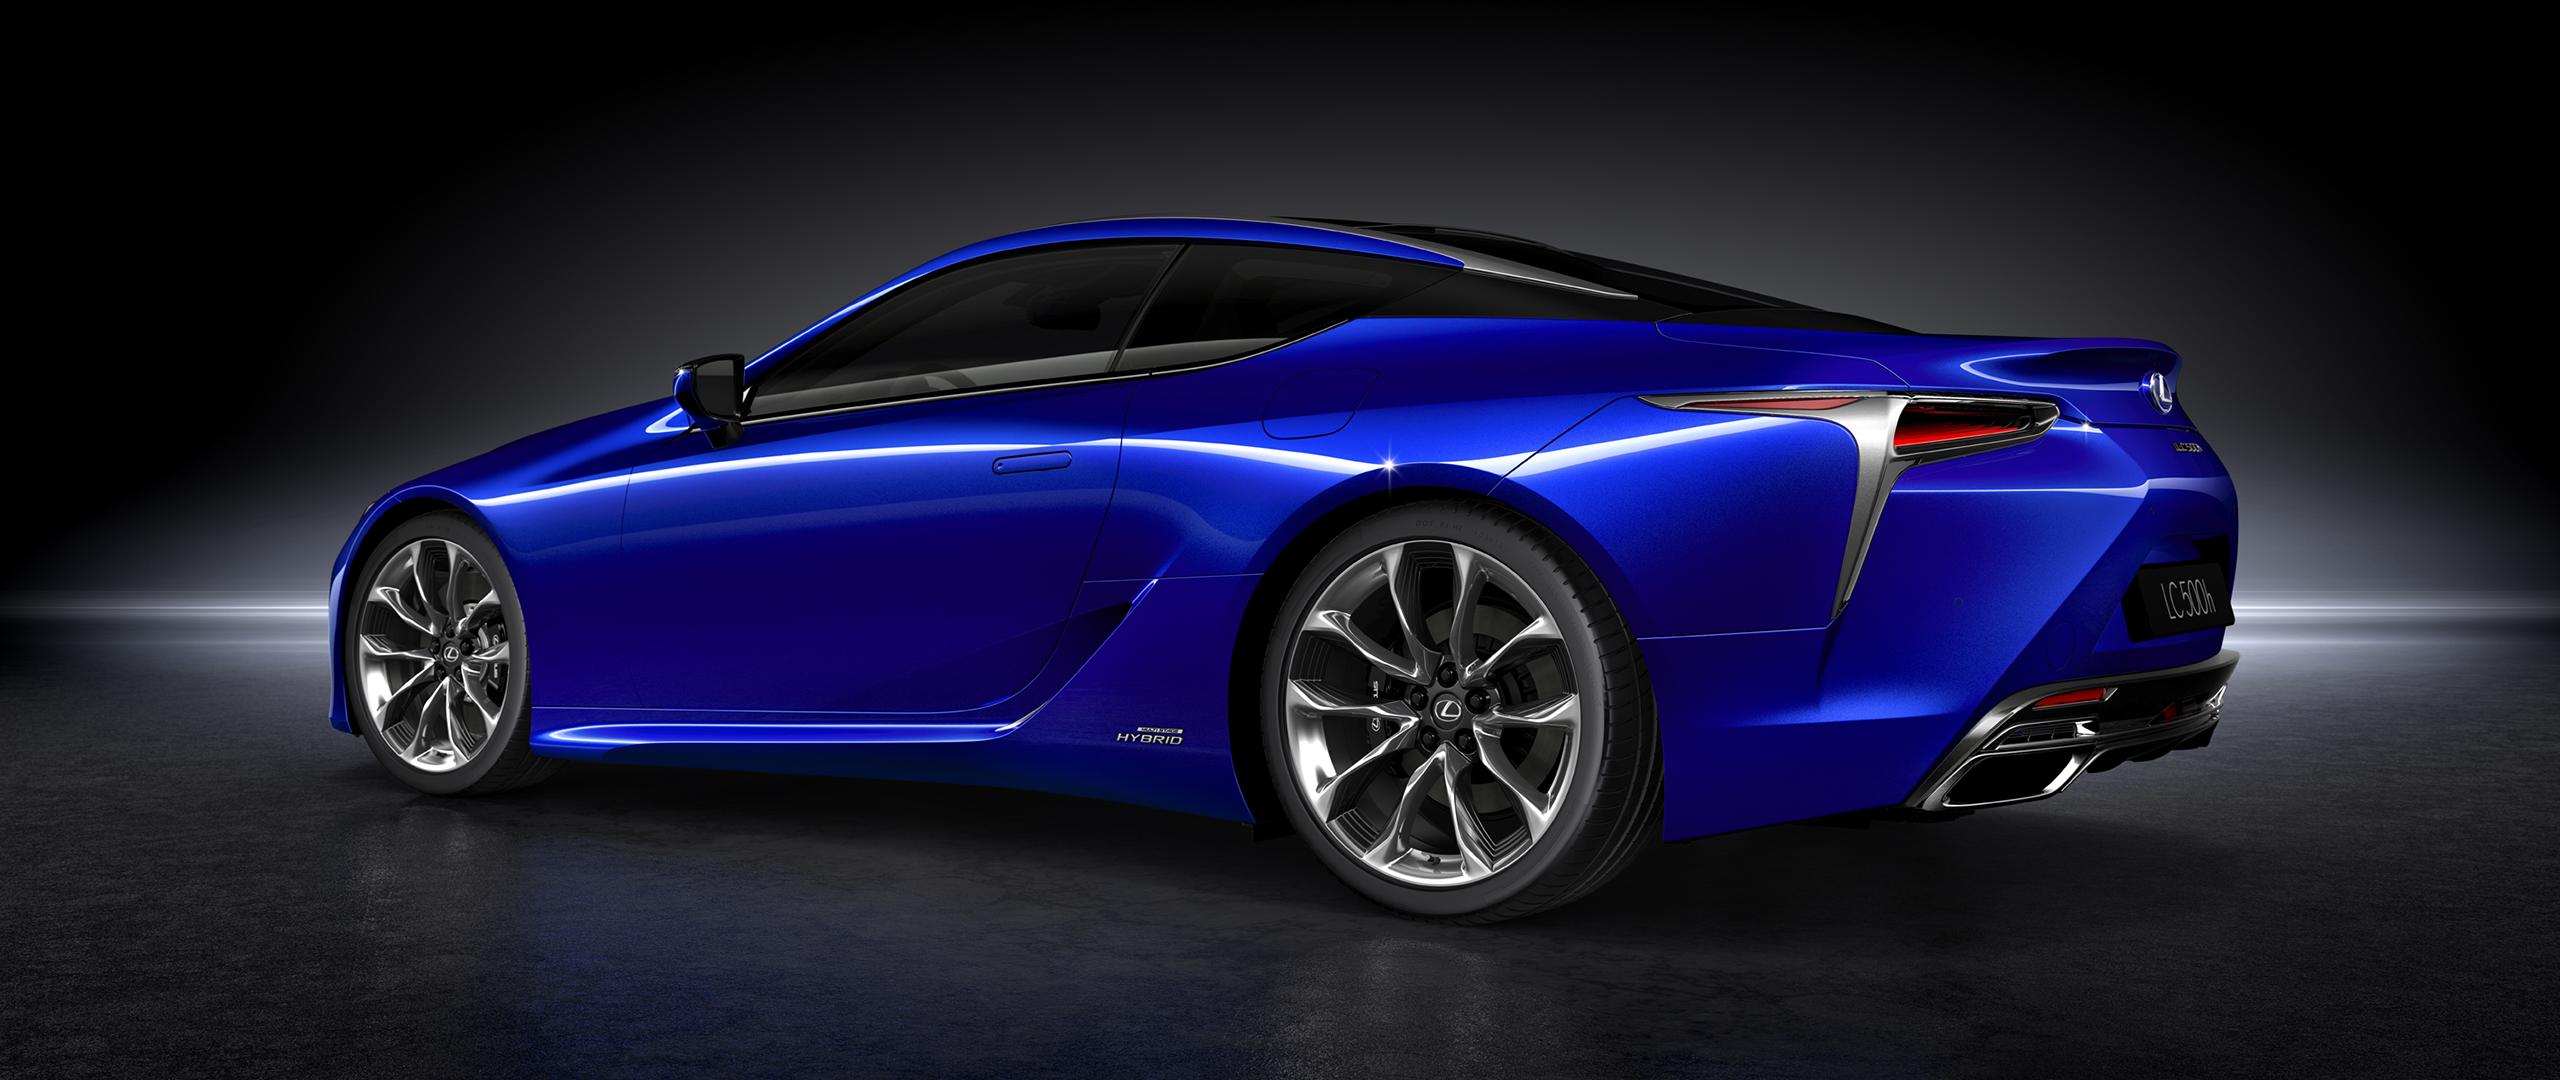 Lexus LC 500, Car, Vehicle, Hybrid, Electric Car Wallpaper